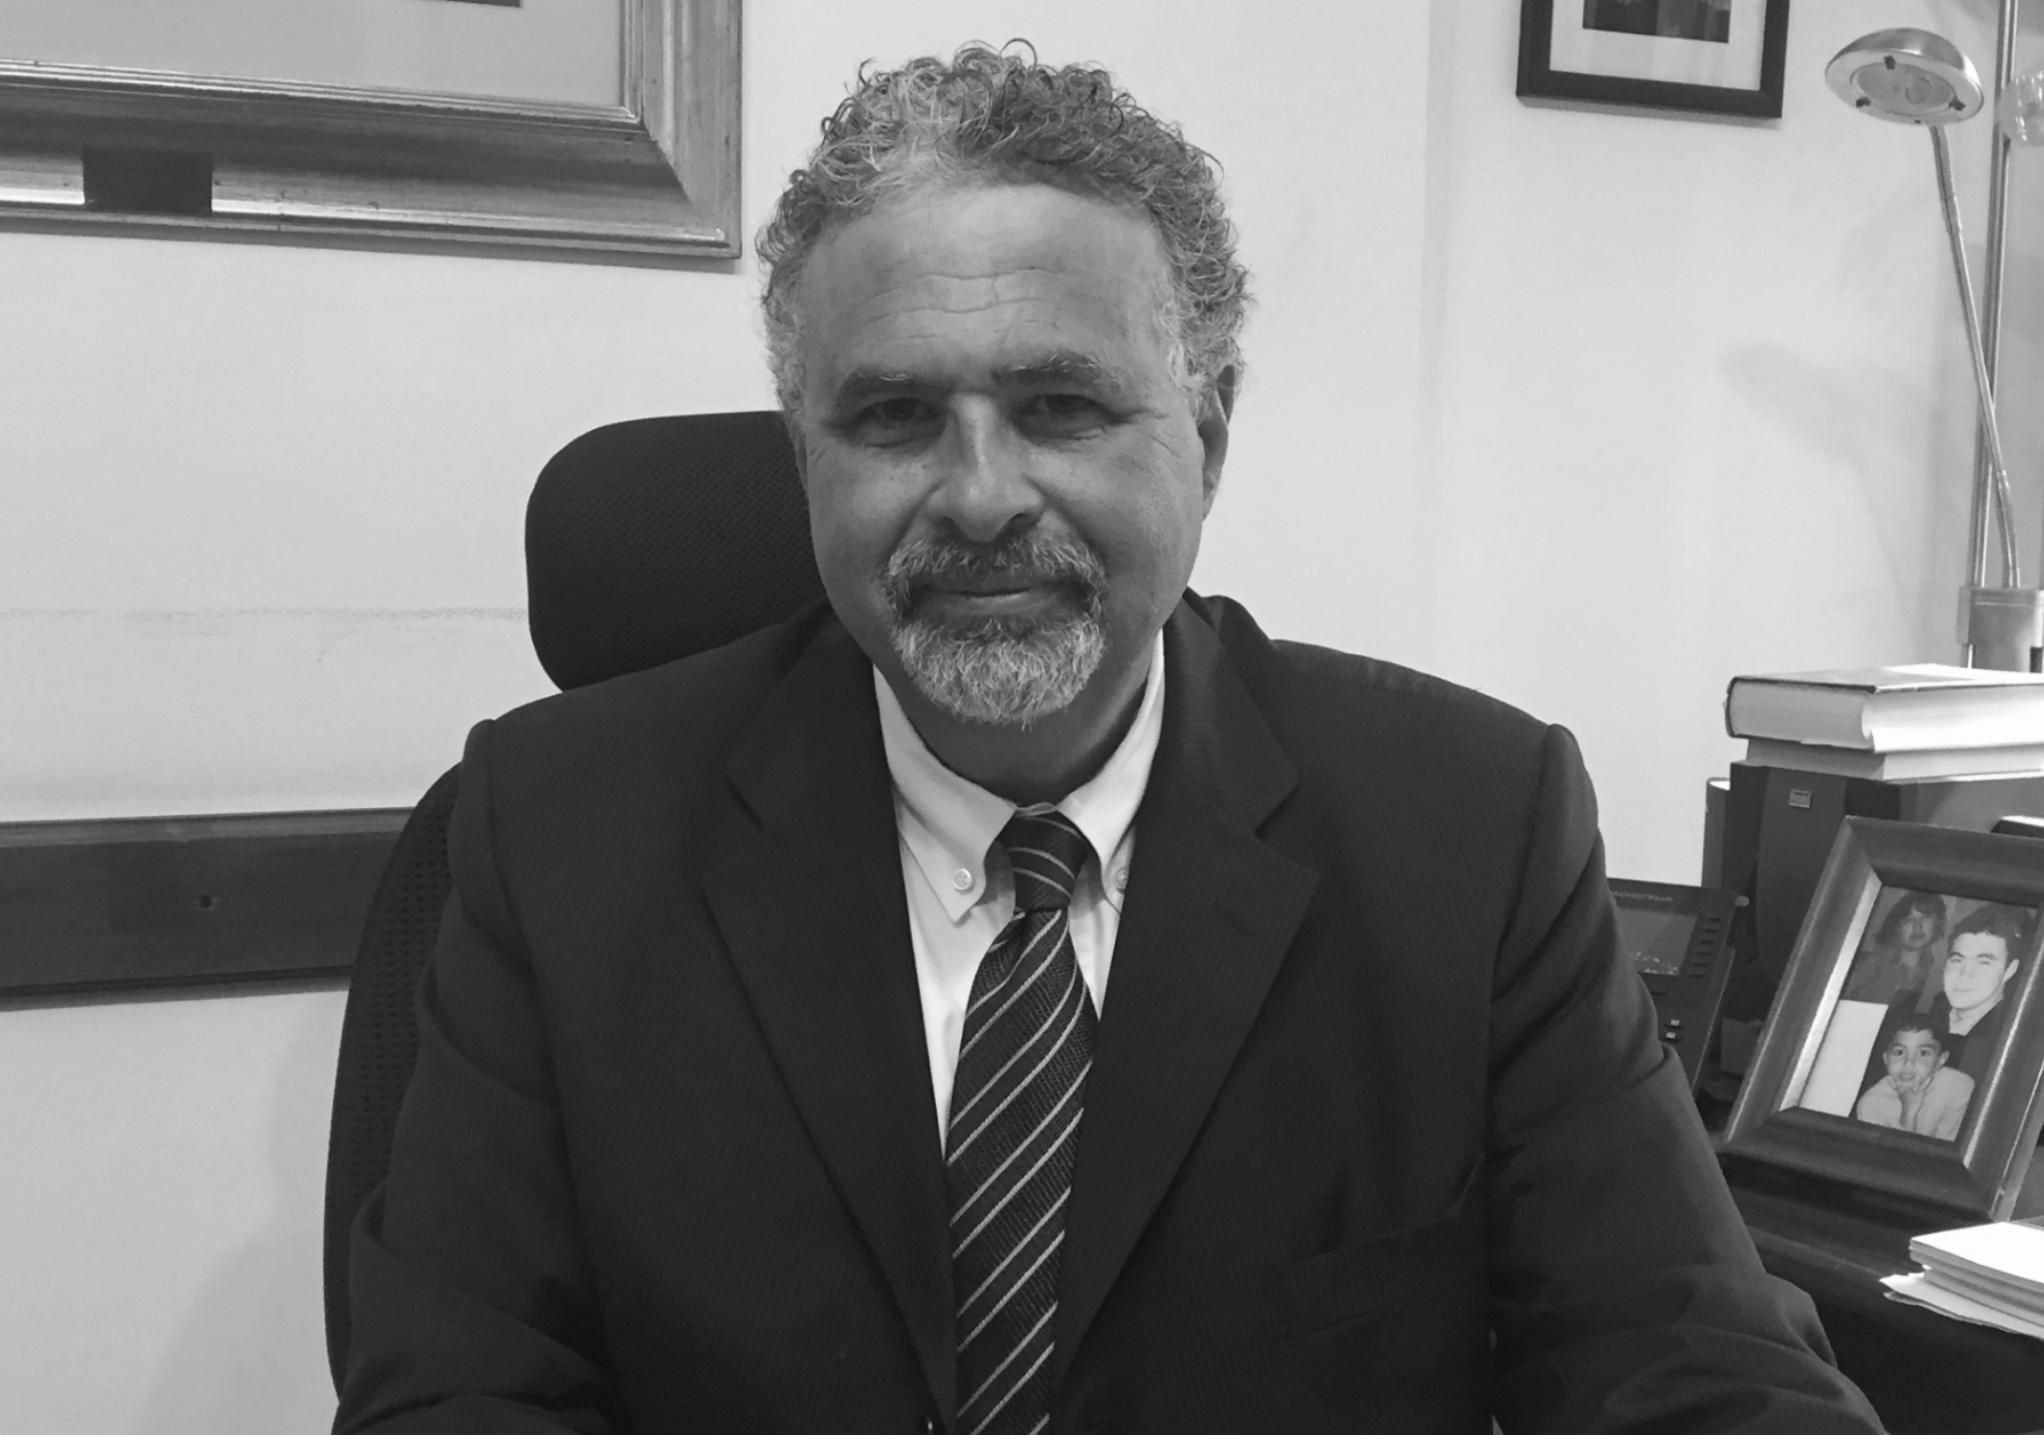 DR. KHALED EL SHALAKANY